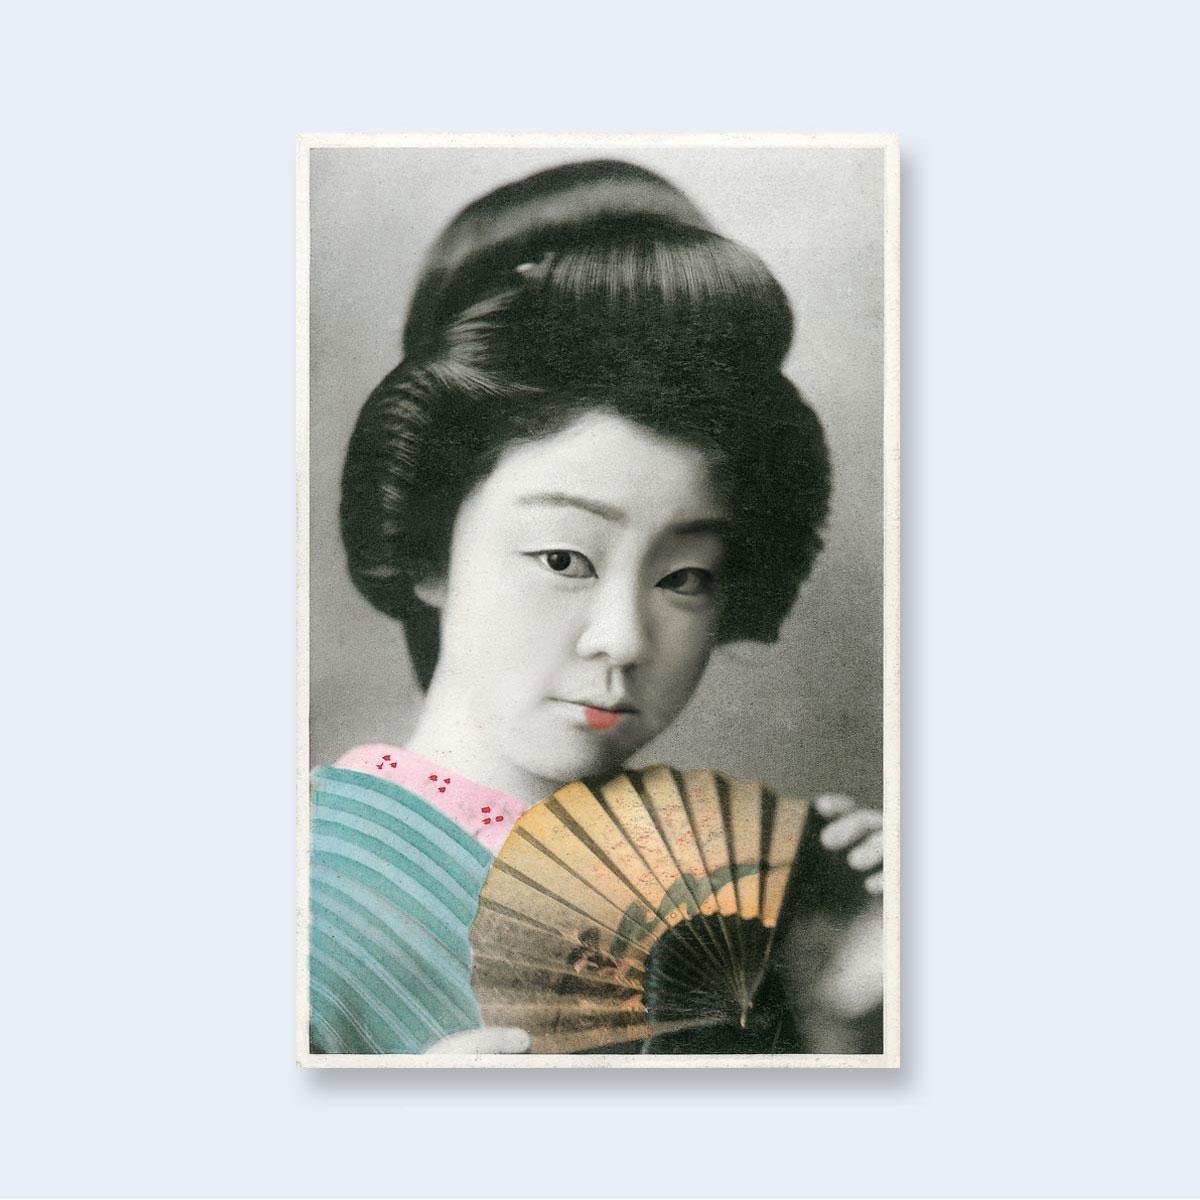 GLORIA KATZ | One Picture Book #100: Souvenirs | Order >